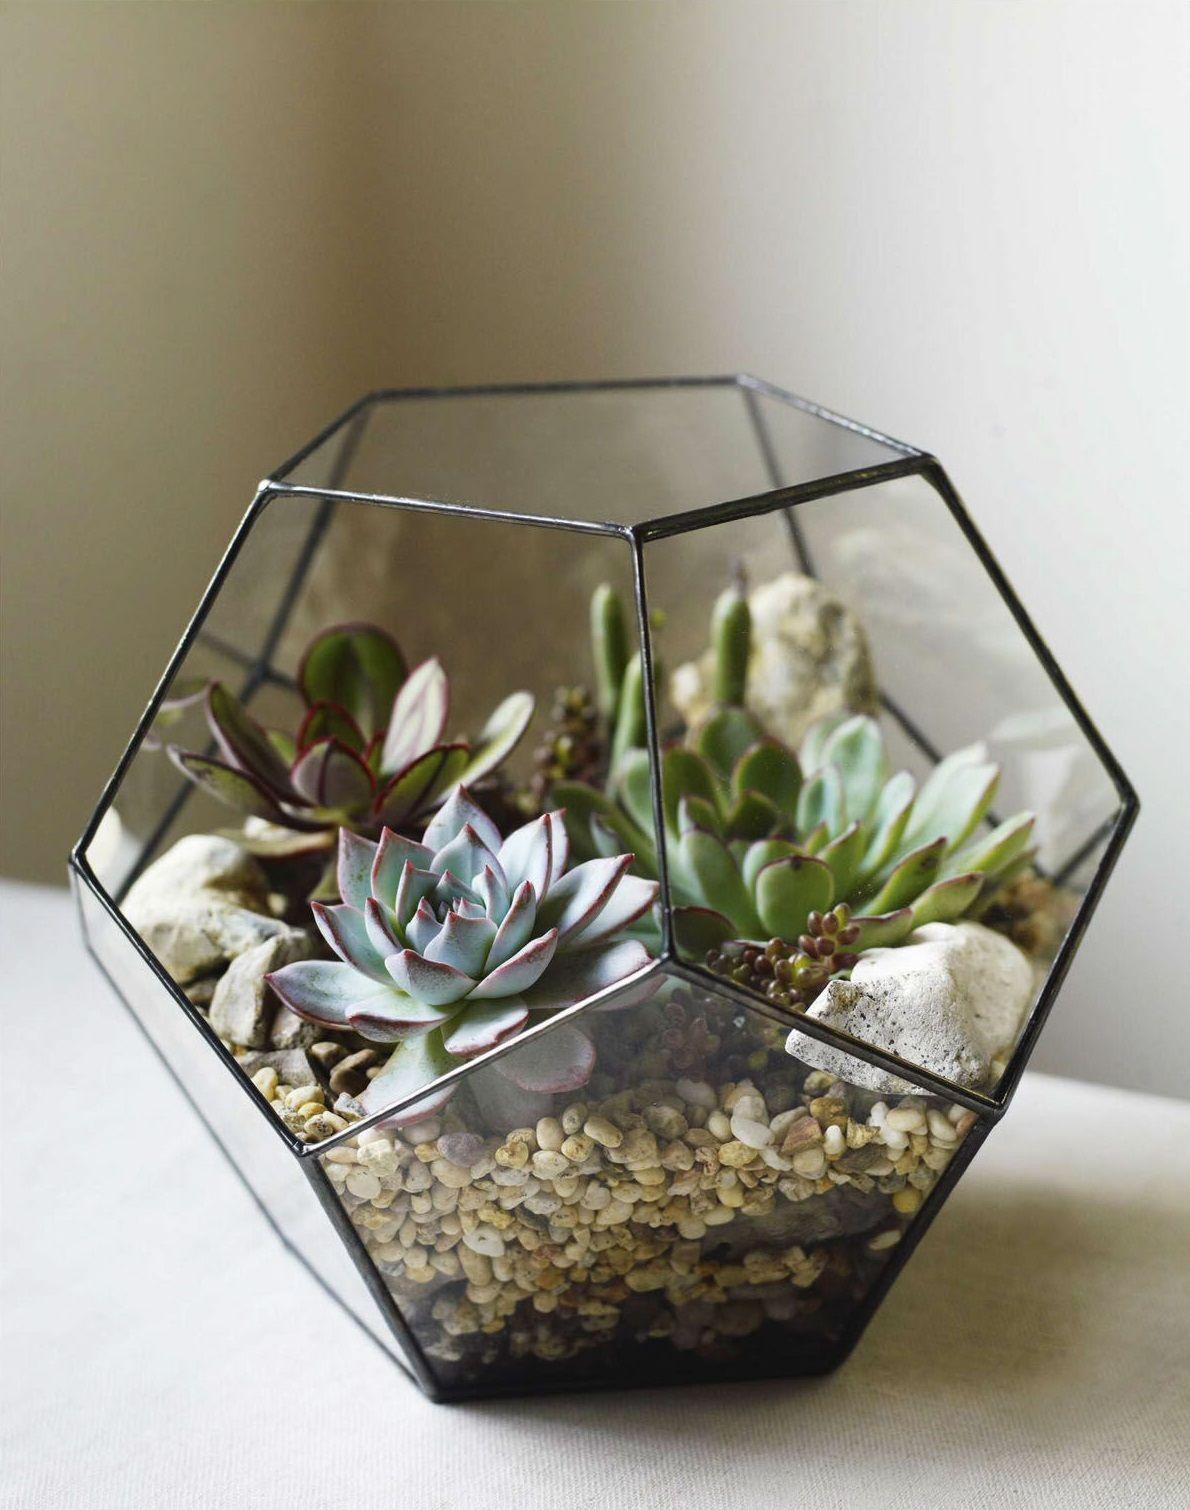 Gartendeko Aus Glas Luxus Glass Dodecahedron with Senecio Articulatus Echeveria